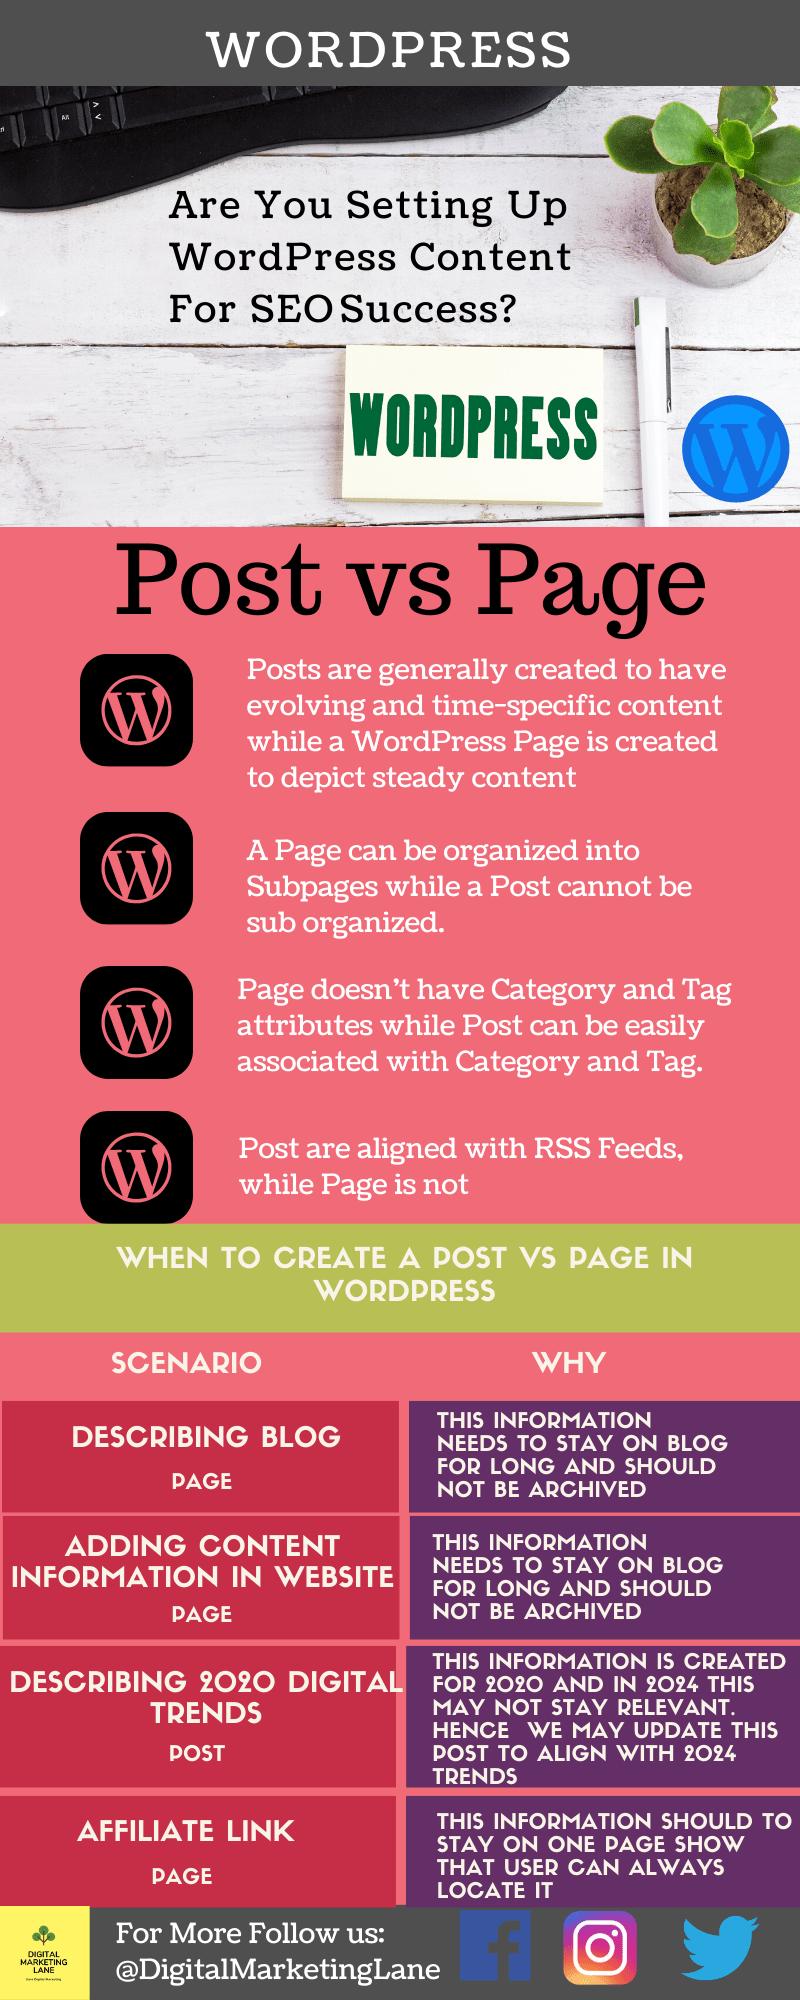 Post vs Page in WordPress